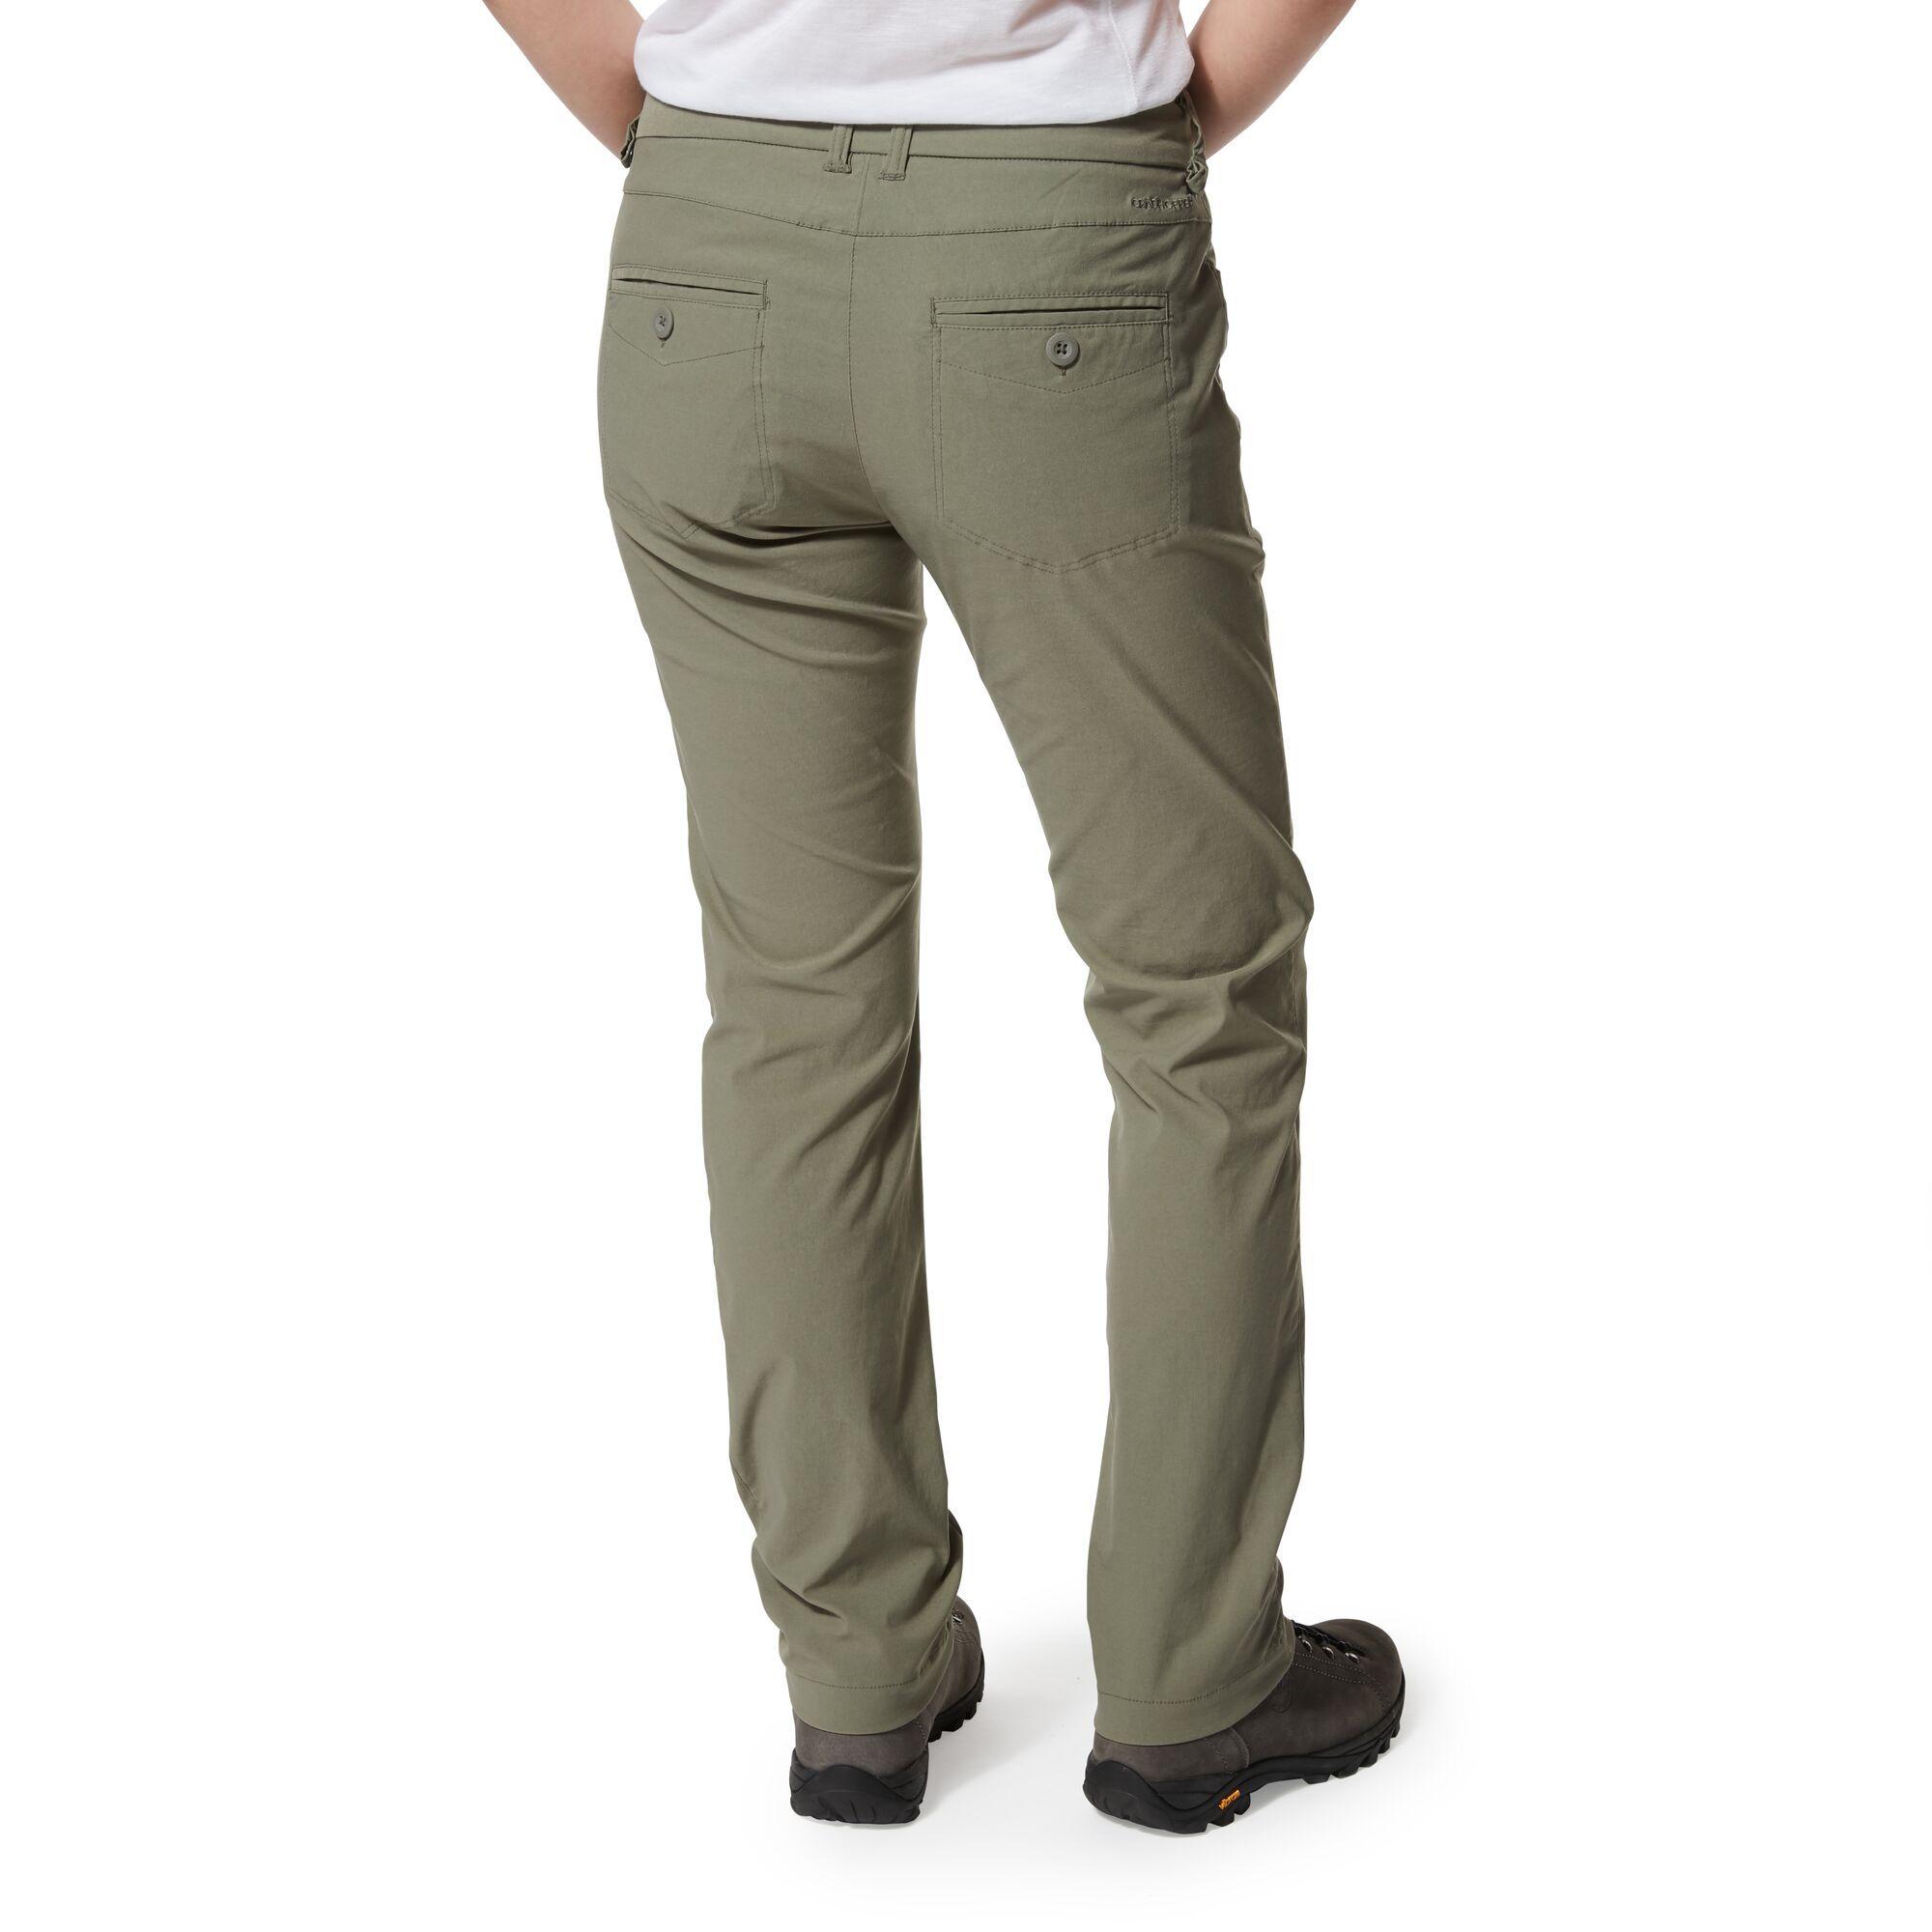 Craghoppers-Pantalon-CLARA-Femme-CG1066 miniature 19